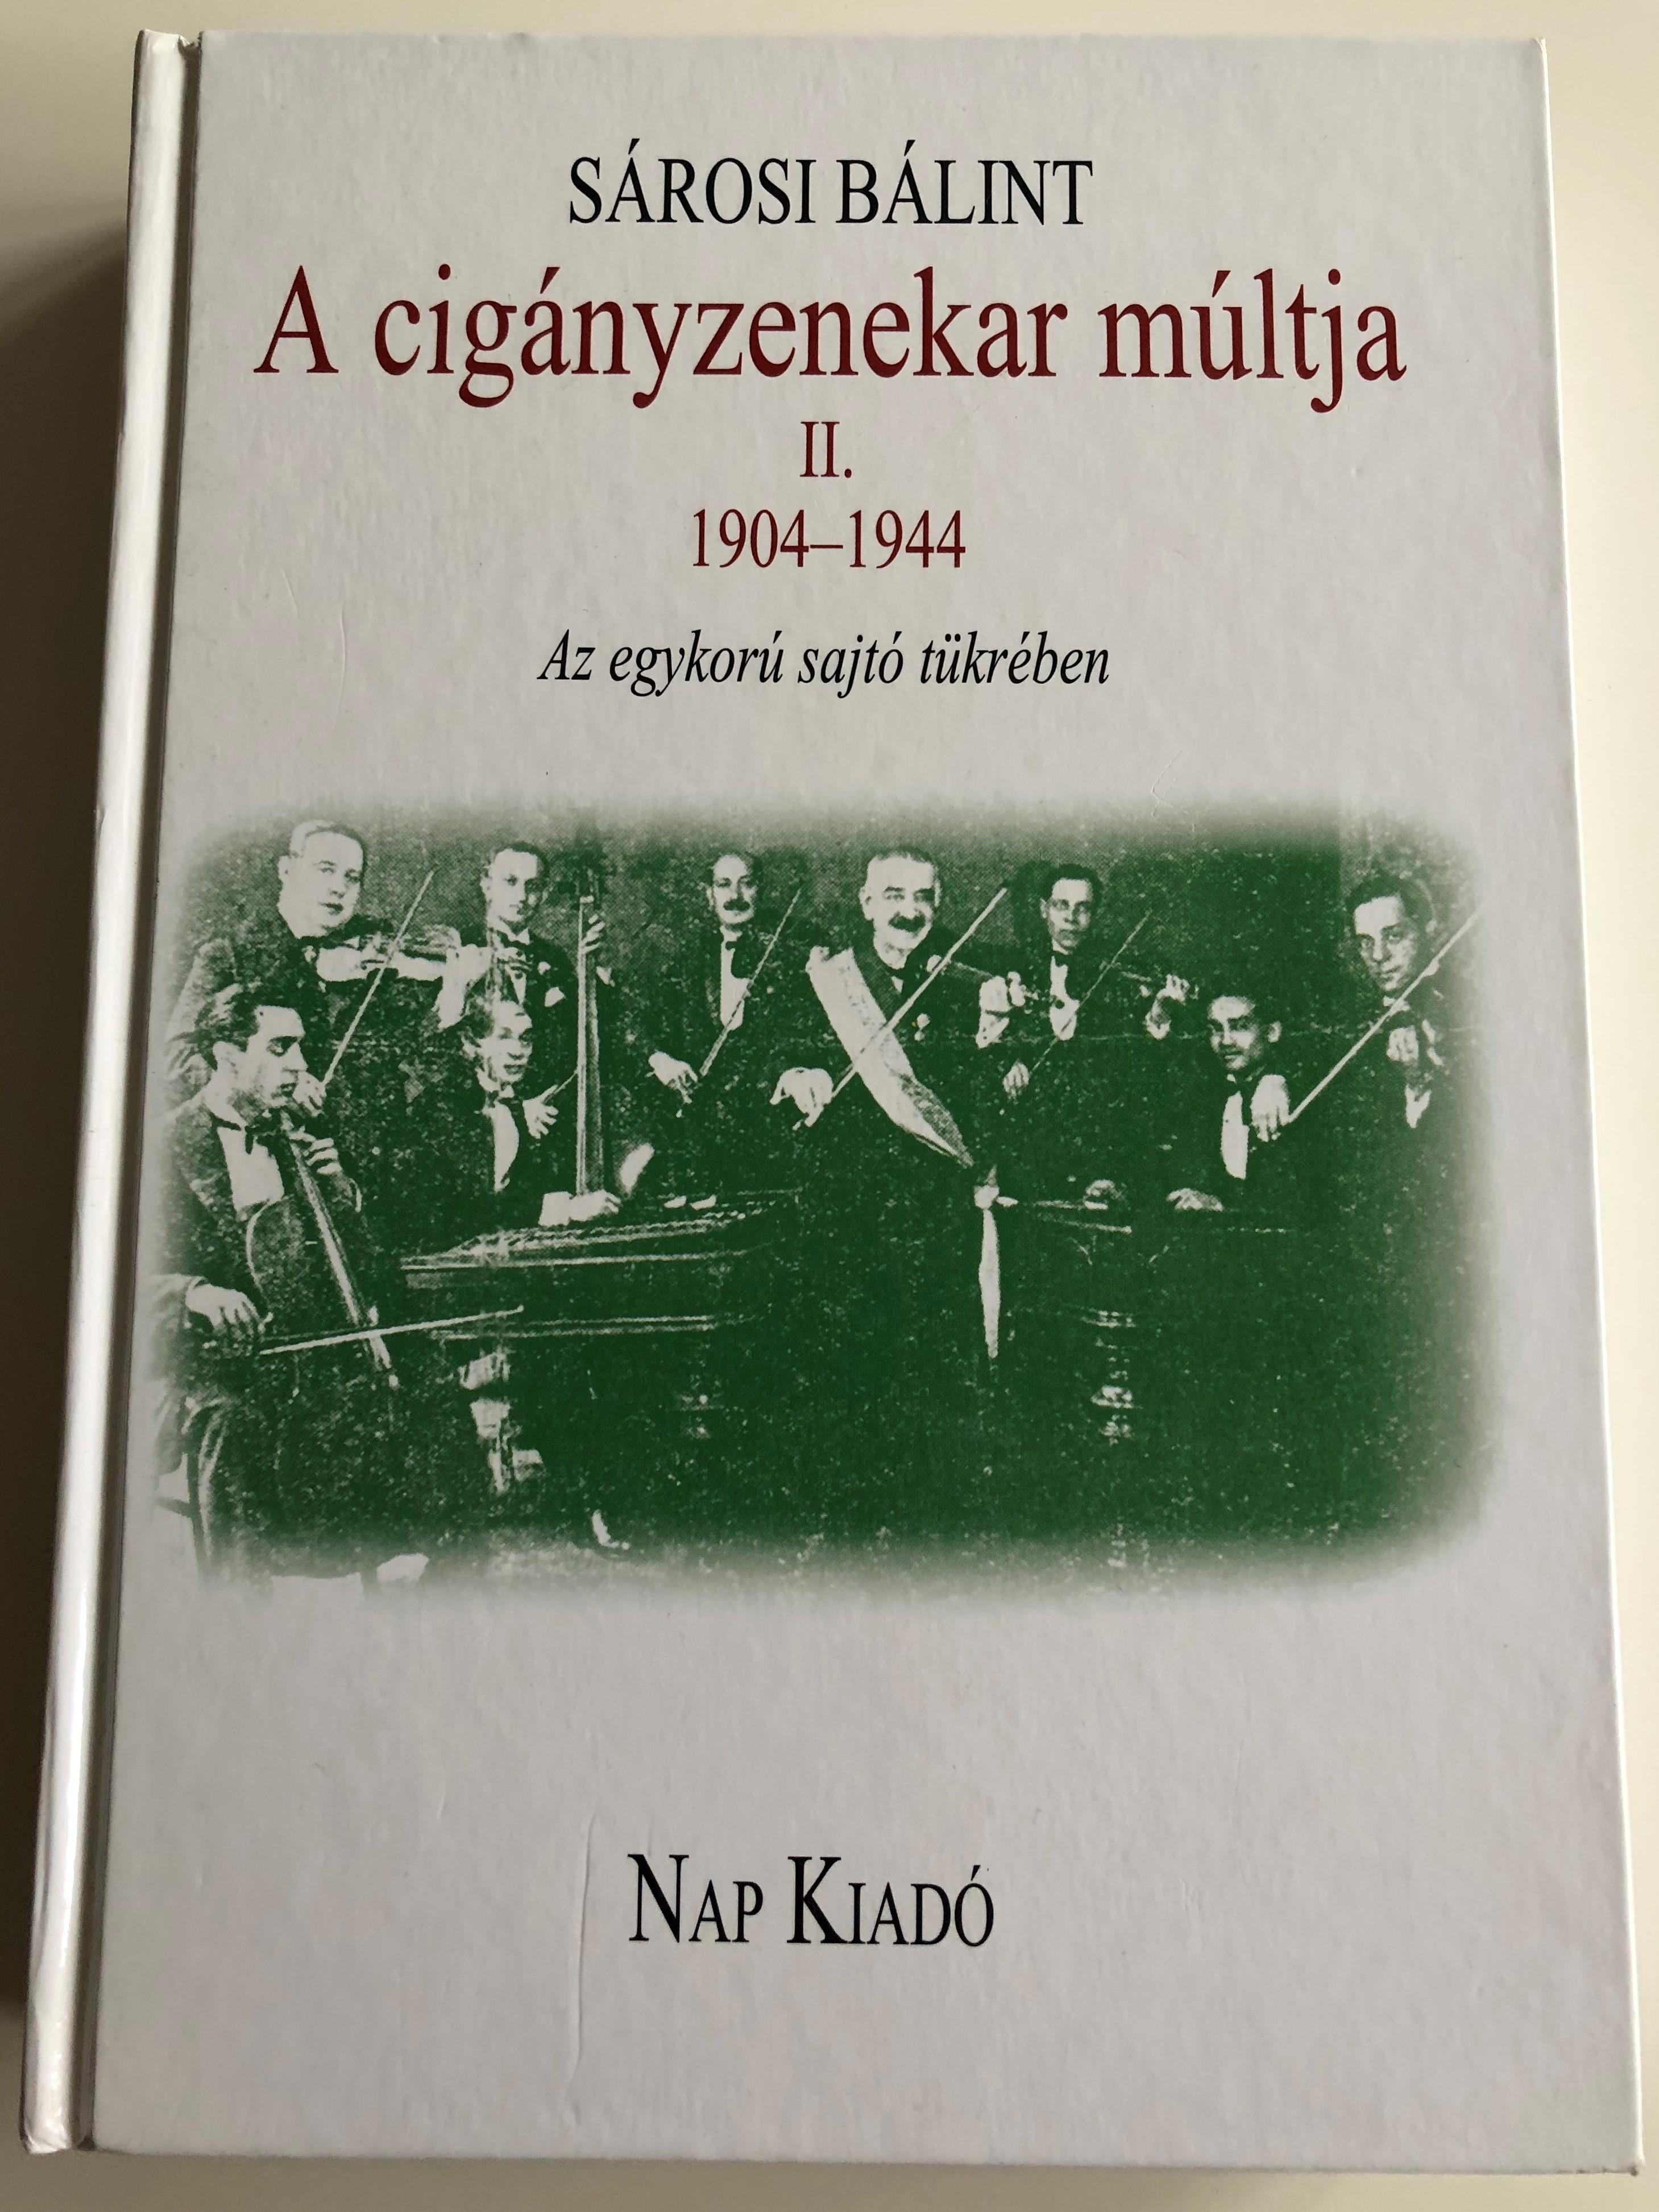 a-cig-nyzenekar-m-ltja-ii-1904-1944-by-s-rosi-b-lint-az-egykor-sajt-t-kr-ben-the-history-of-the-hungarian-gypsy-orchestra-1904-1944-nap-kiad-hardcover-2012-1-.jpg